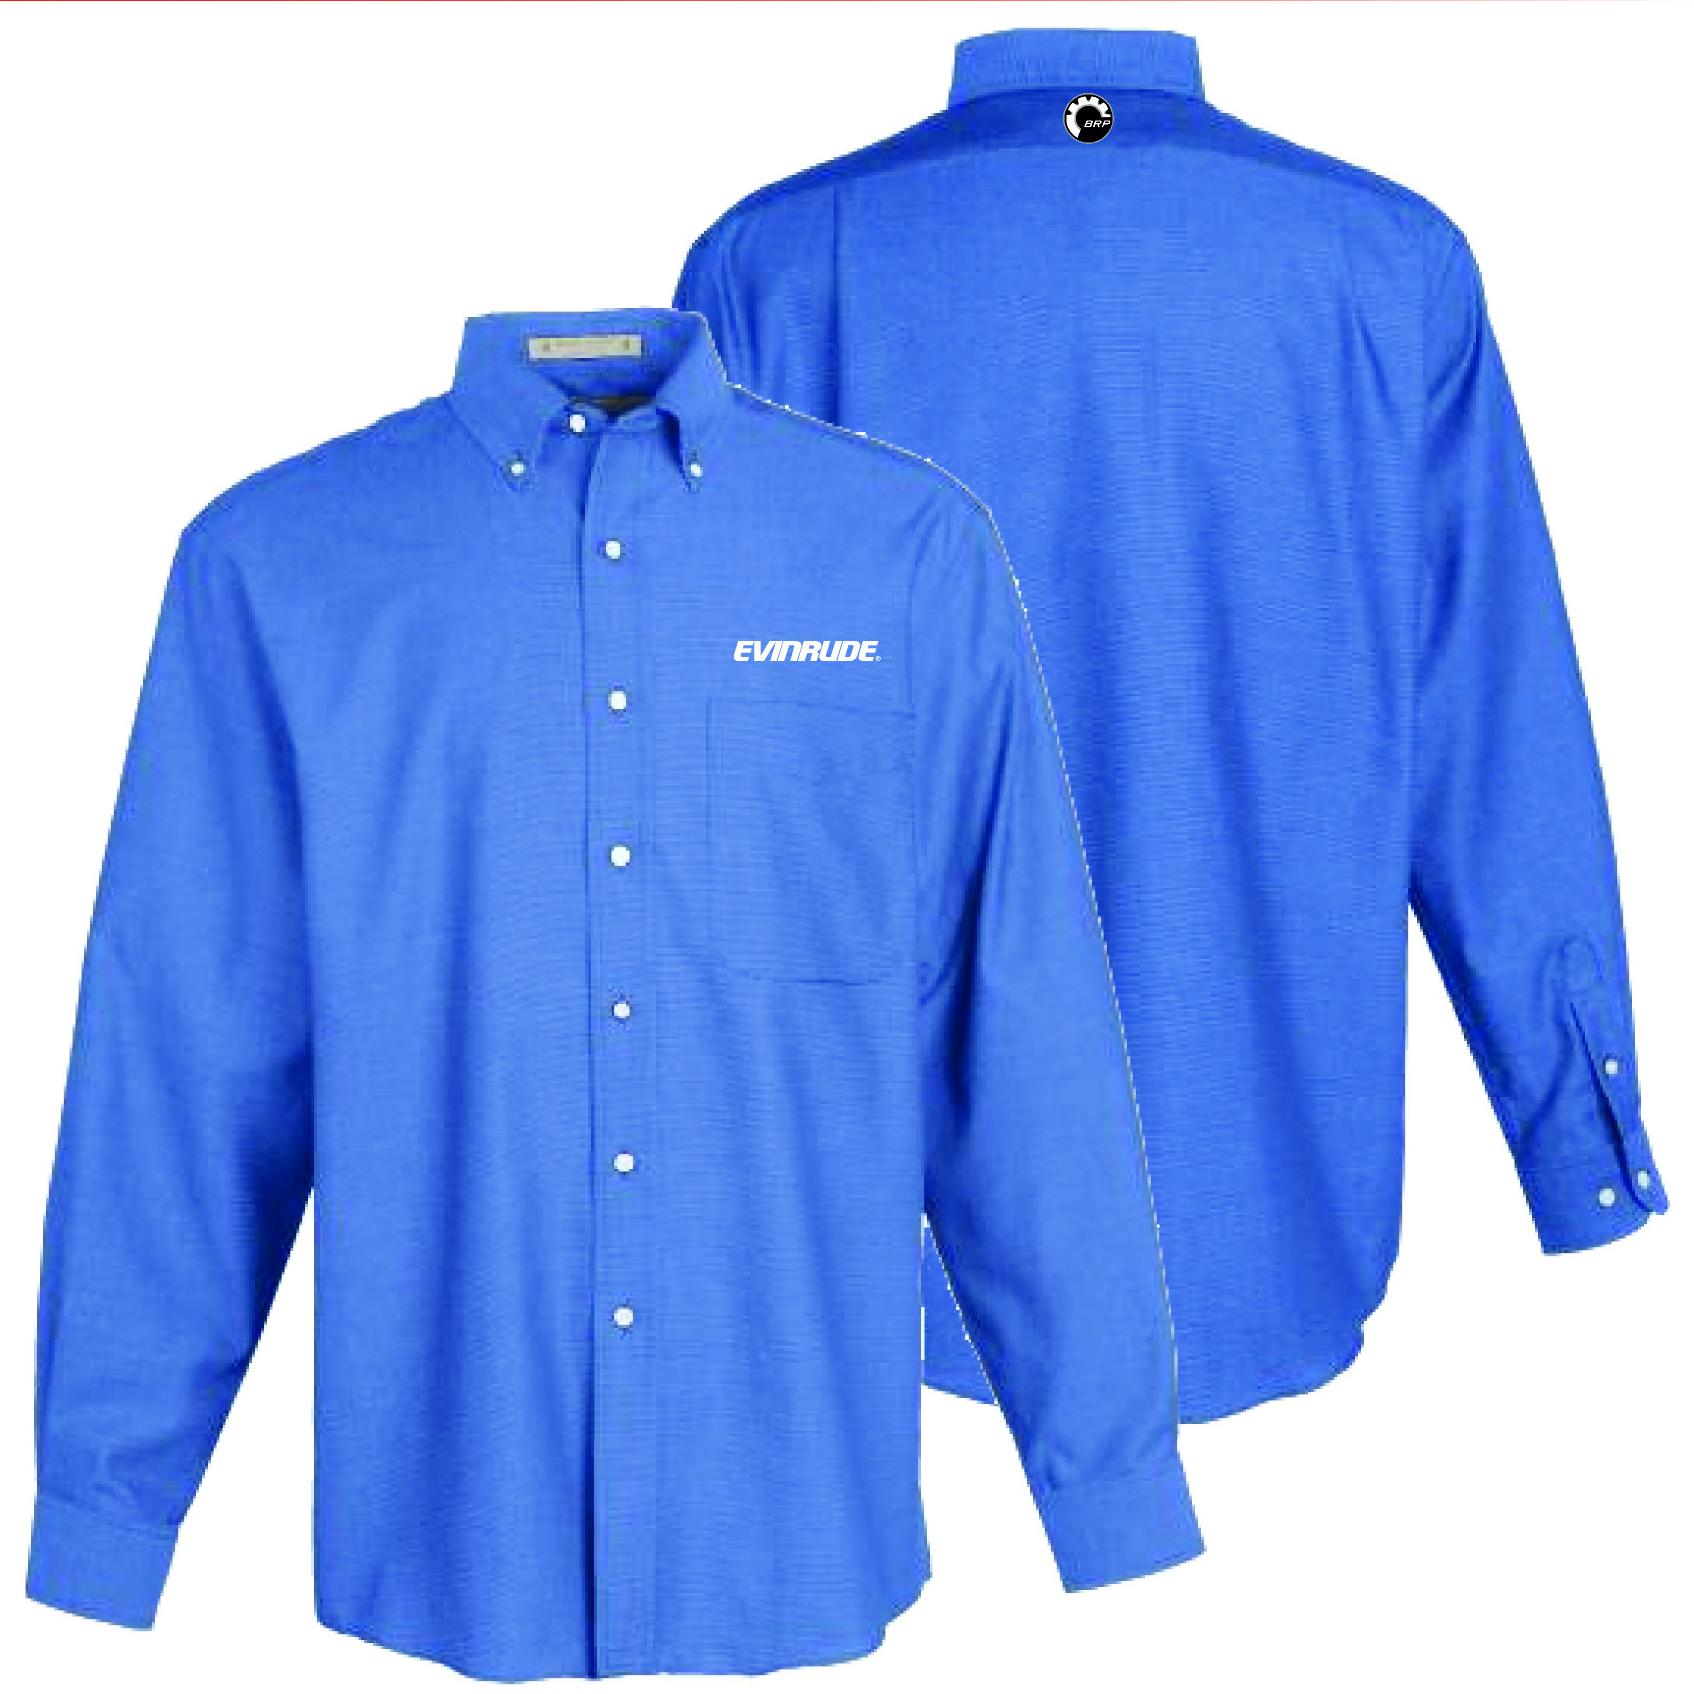 evinrude men 39 s french blue oxford shirt shirts